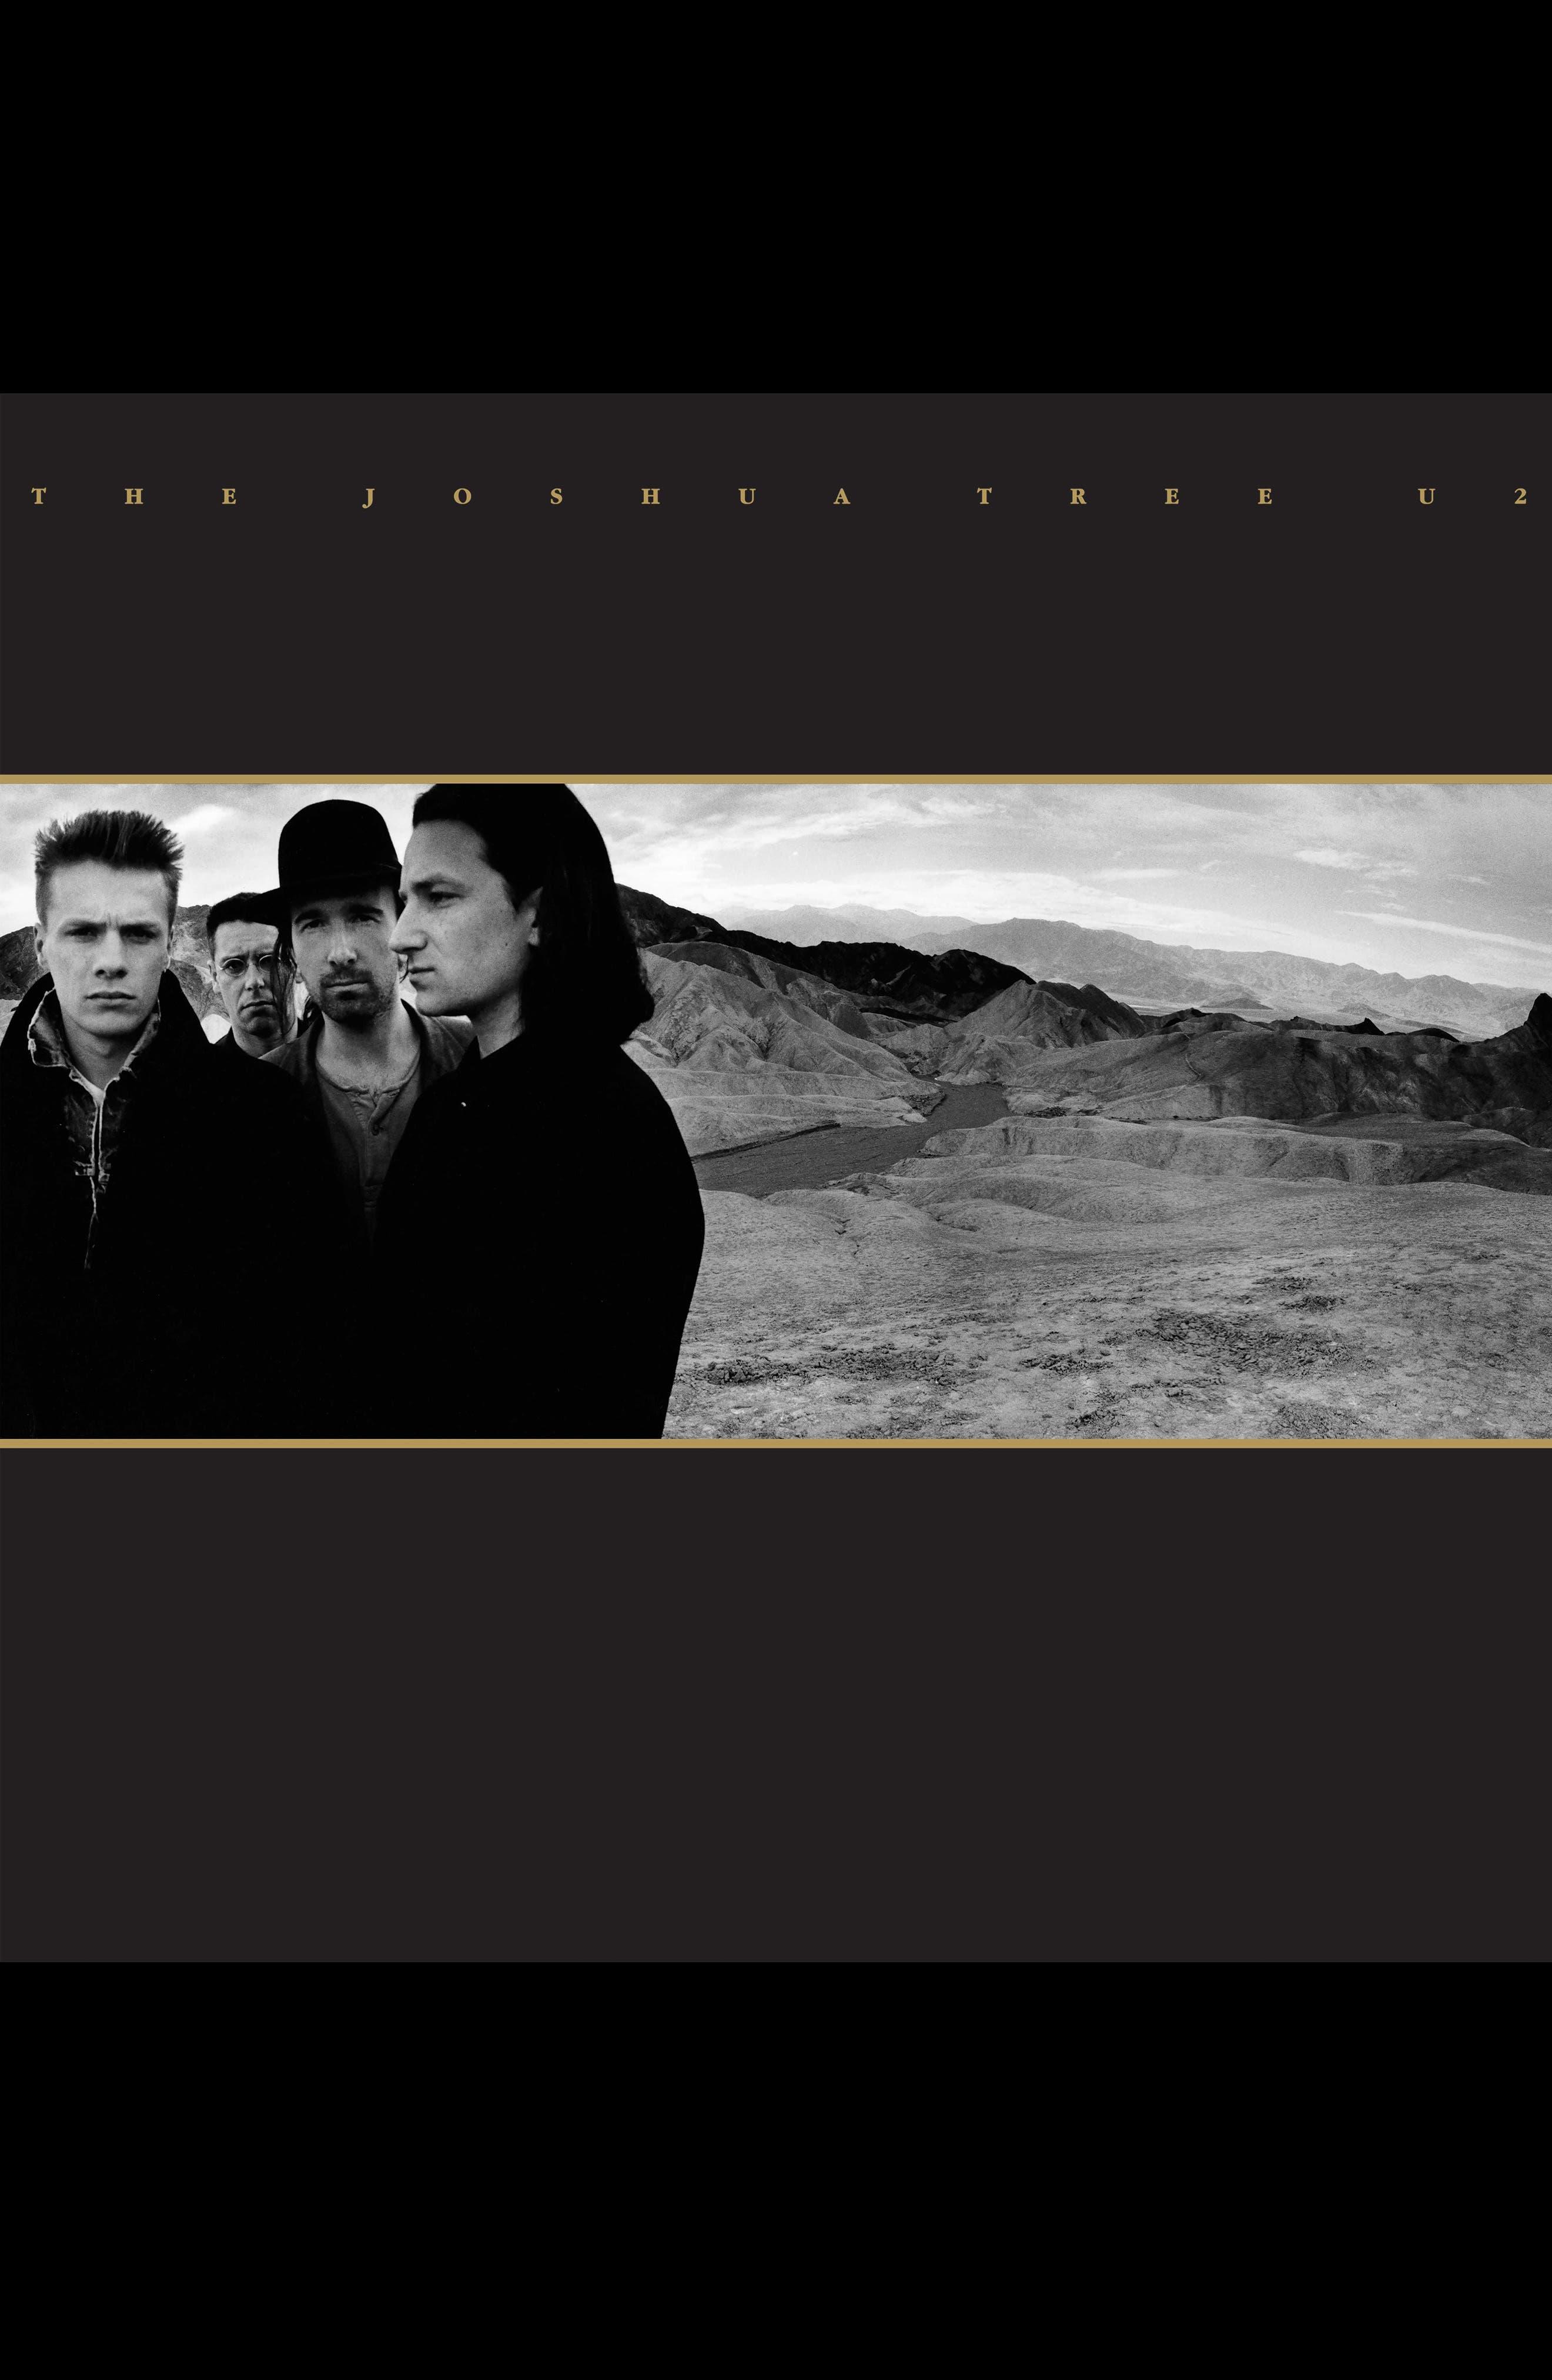 U2 Joshua Tree Limited Edition 30th Anniversary LP Vinyl Album